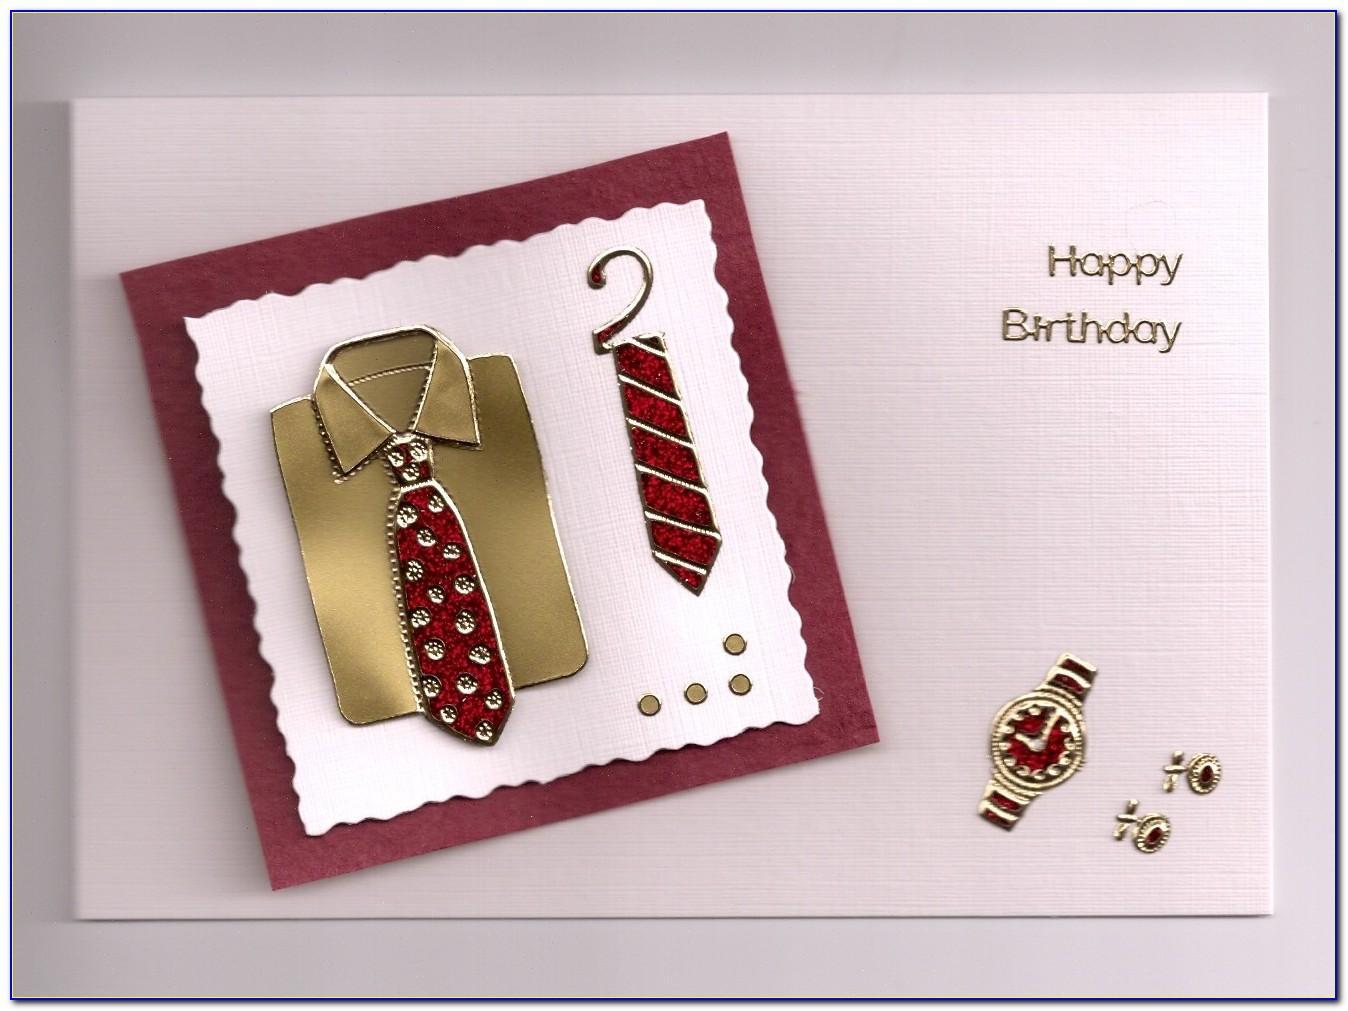 Homemade Birthday Cards For Guys